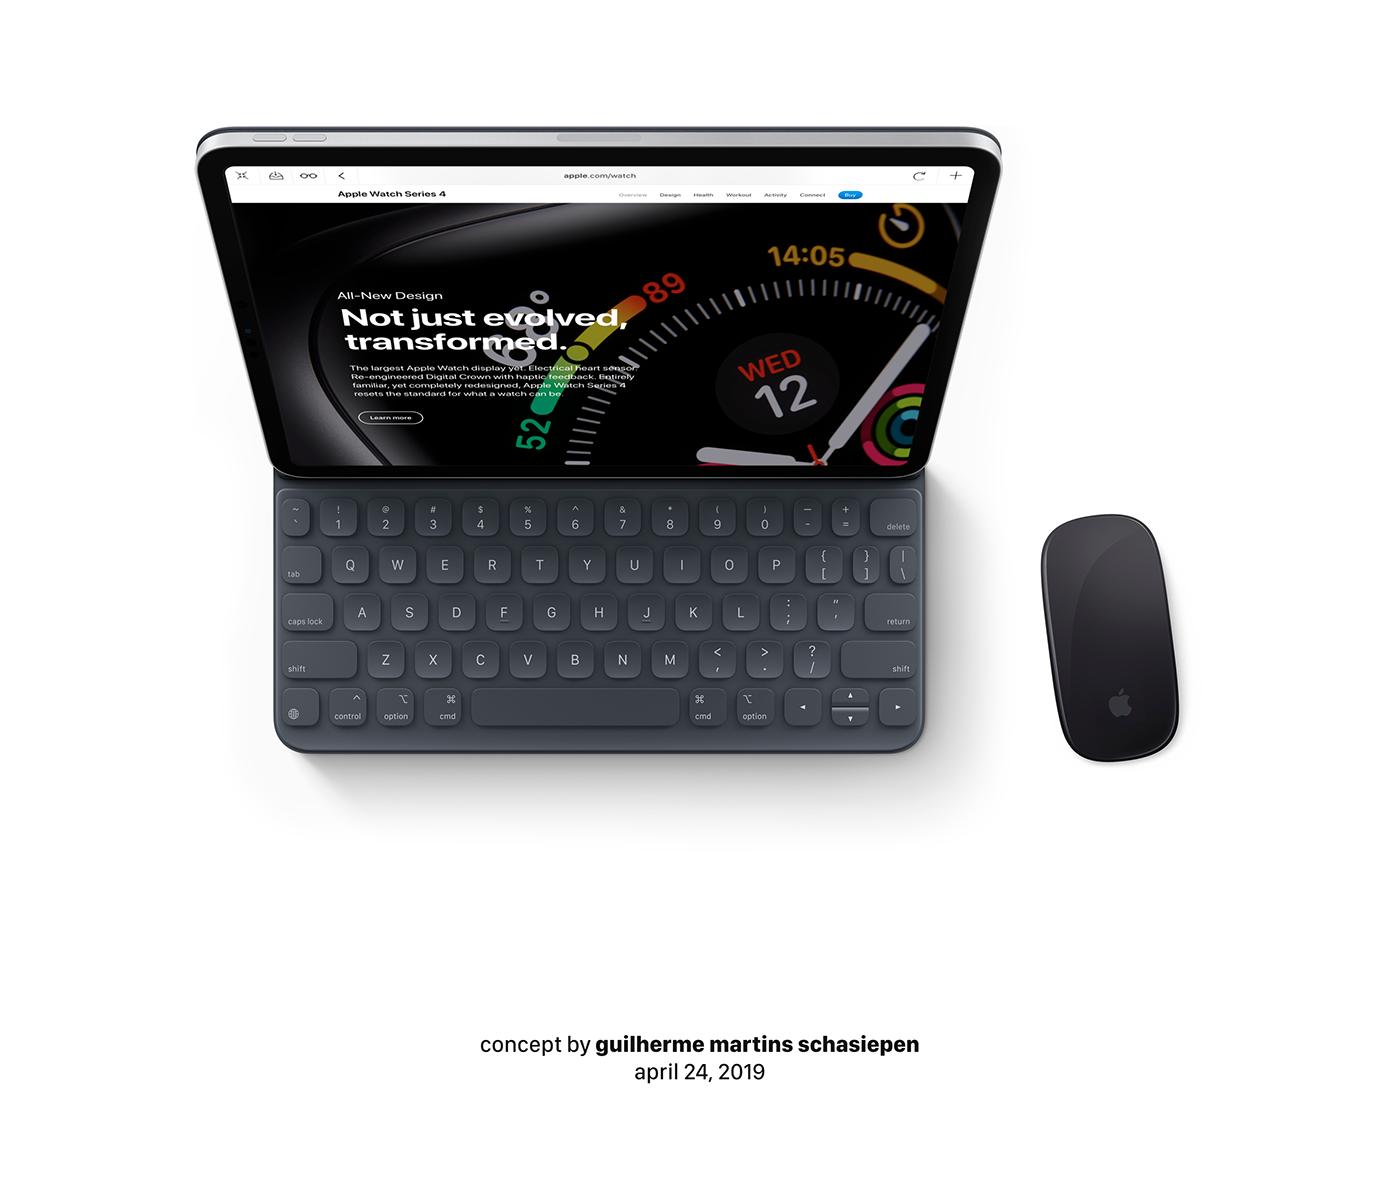 apple iPad ipad pro ios 13 ios13 mouse magic mouse mac macbook icloud